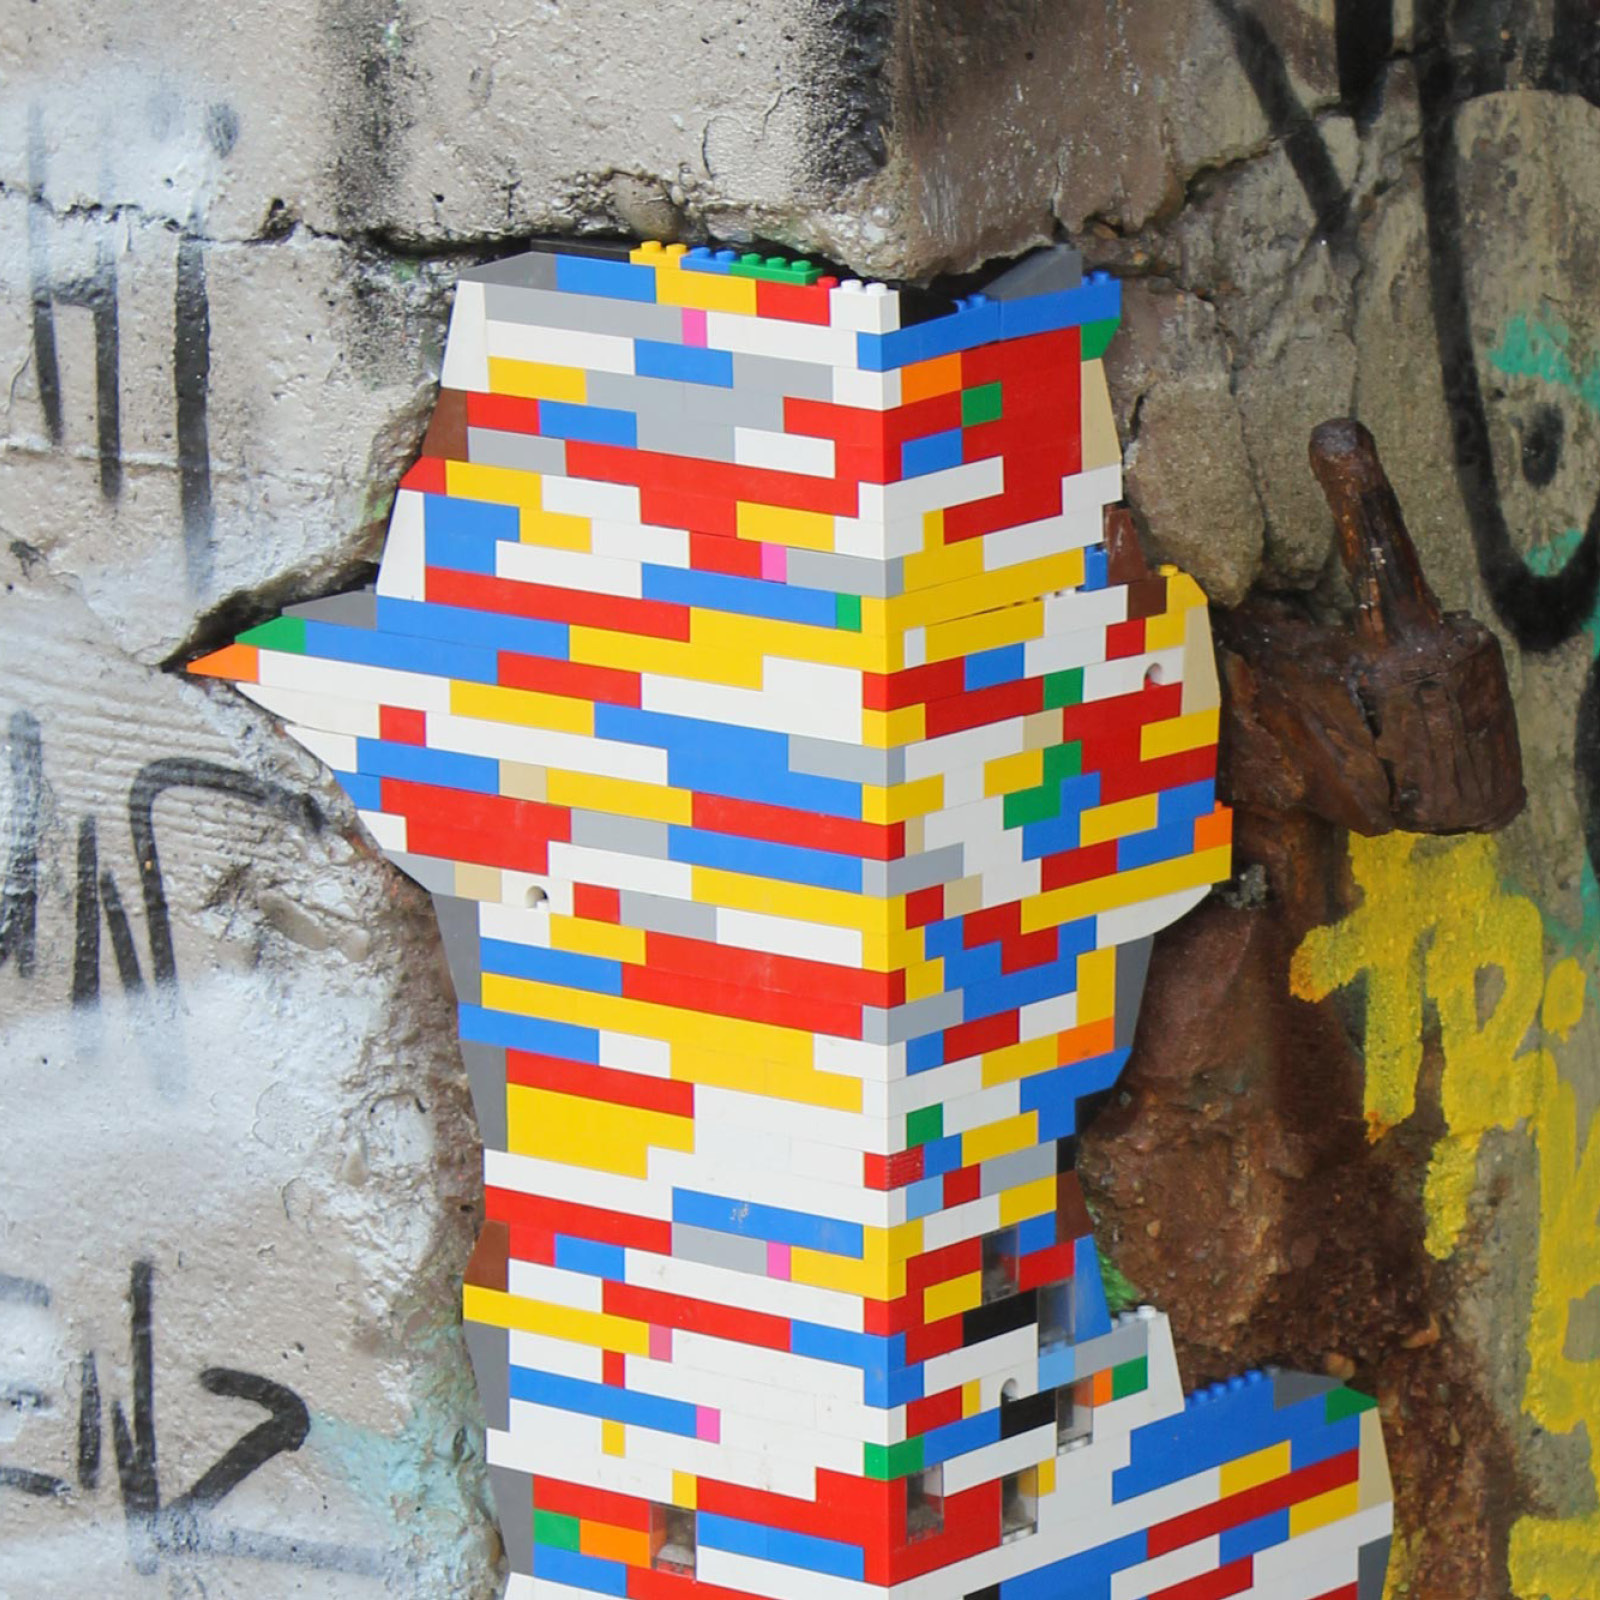 German artist Jan Vormann brings global Dispatchwork project to Nuart Aberdeen